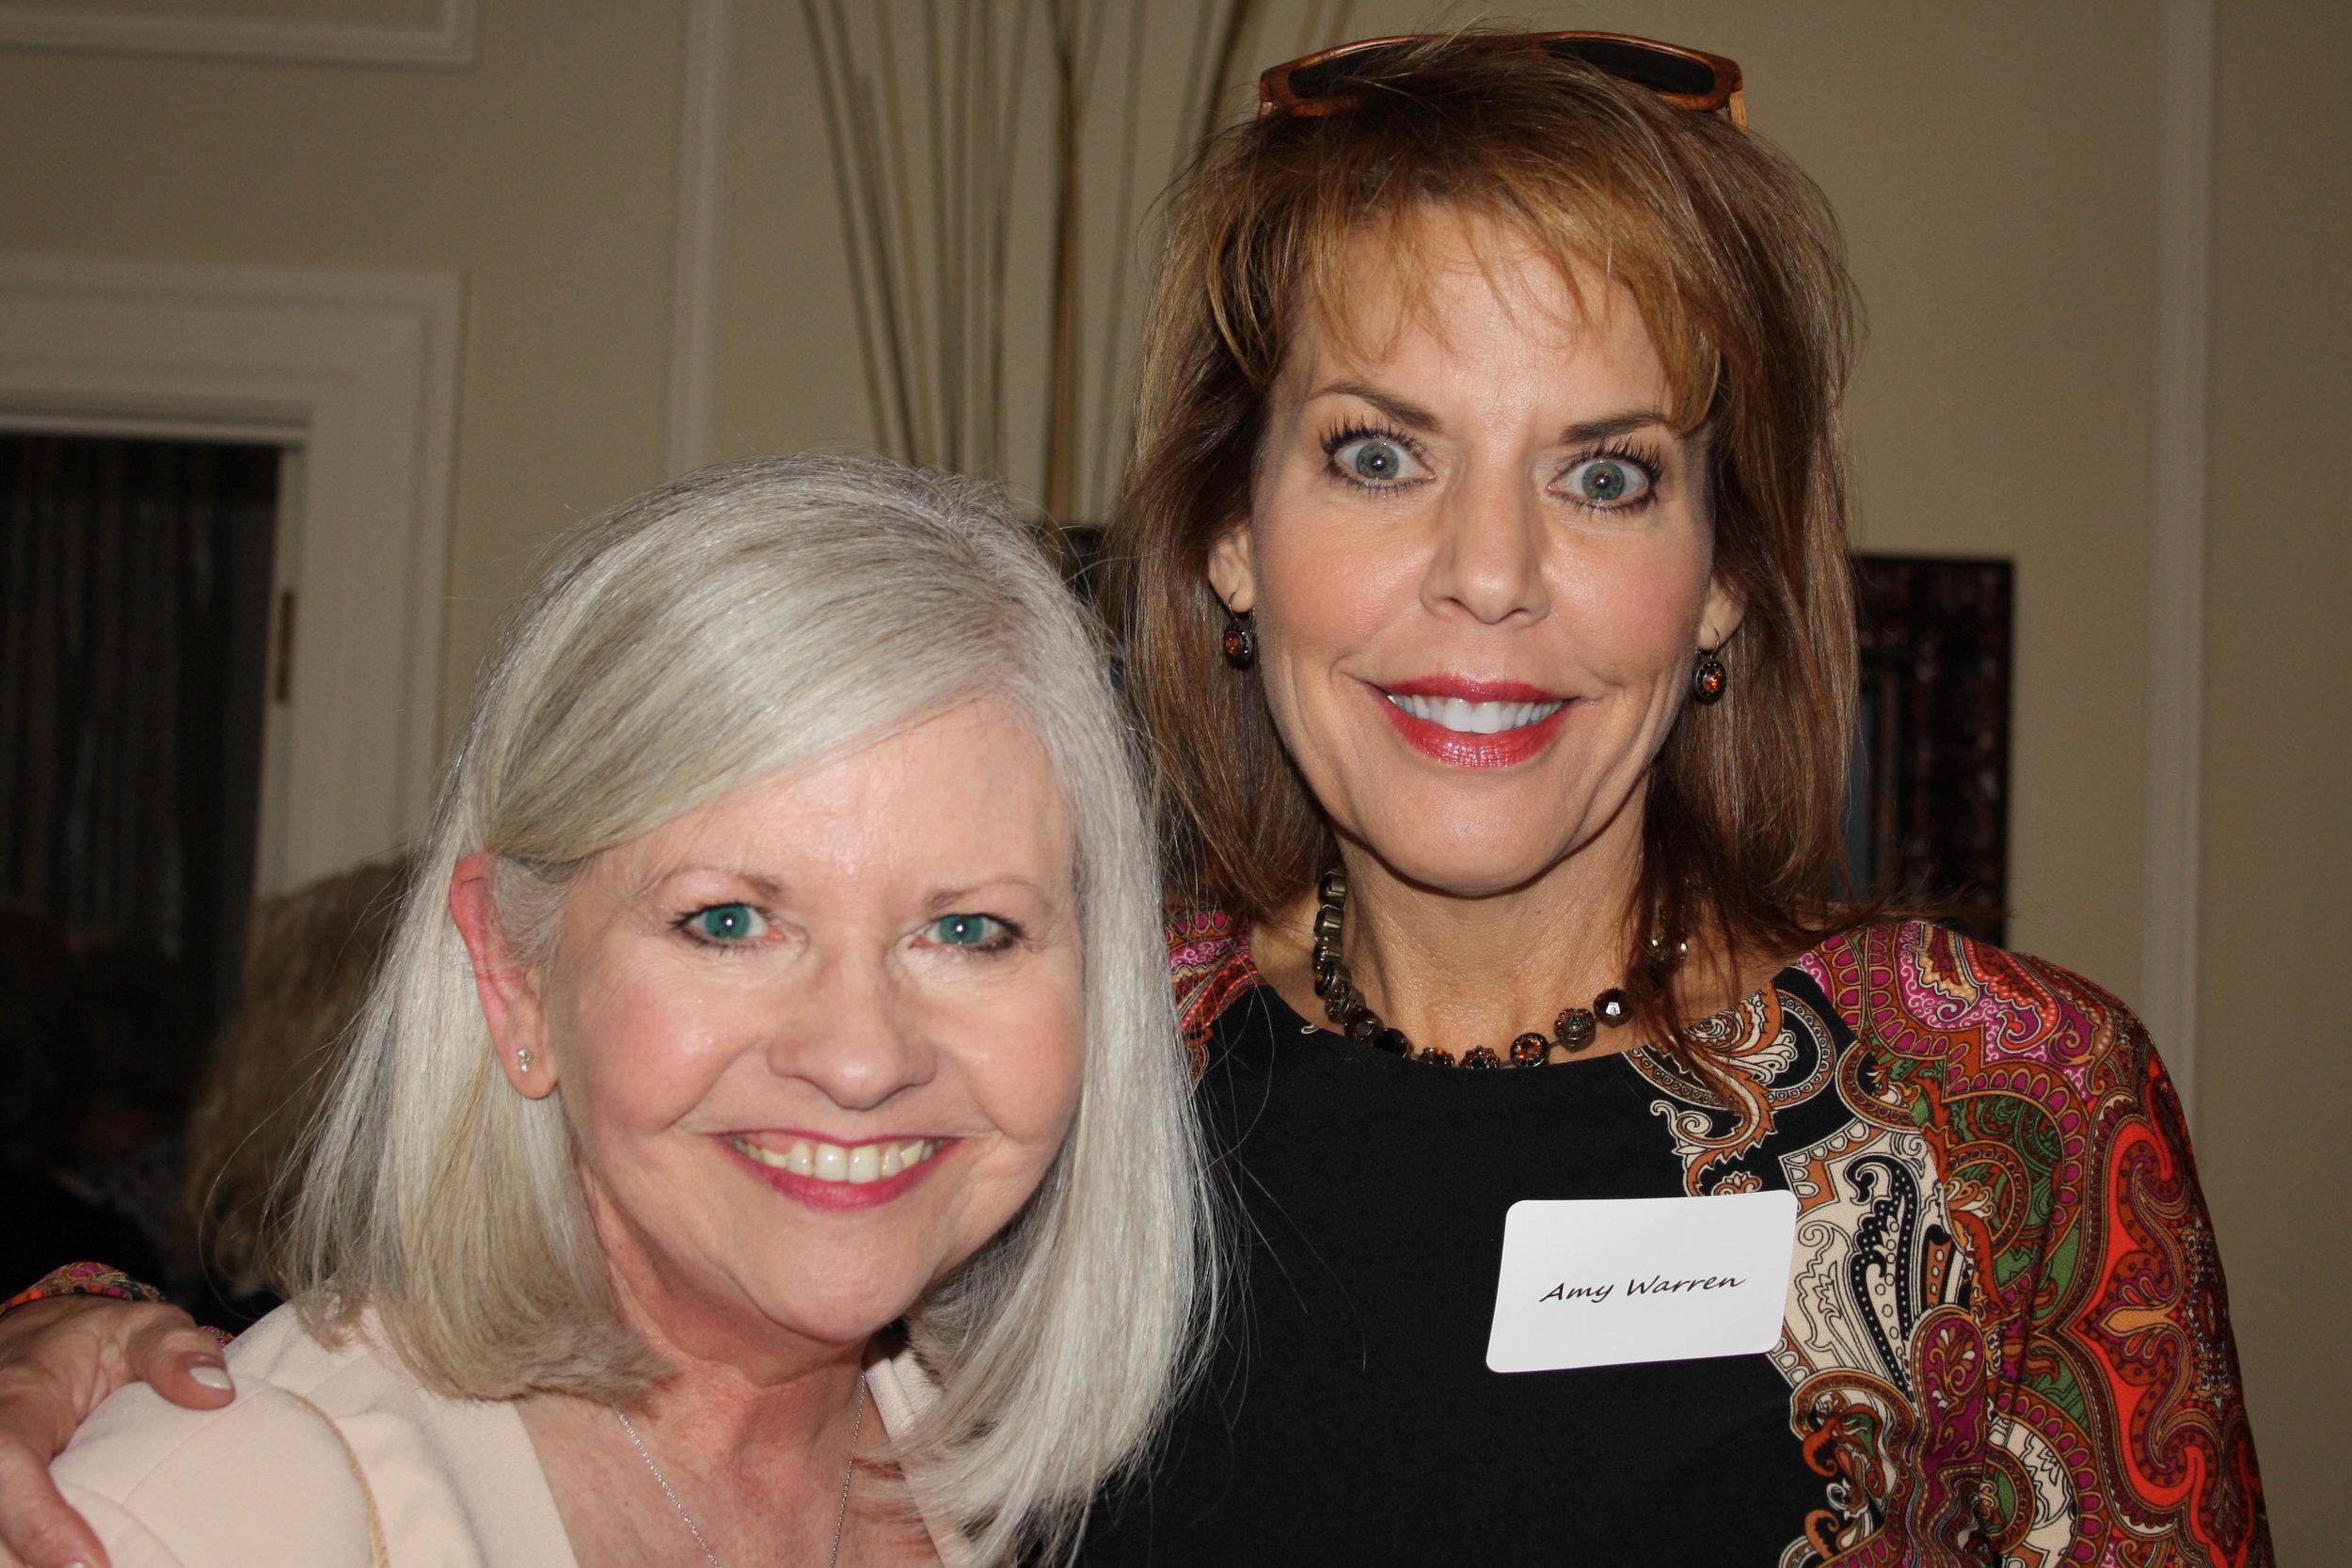 Judge Sherry Jackson Hawkins and Amy Warren